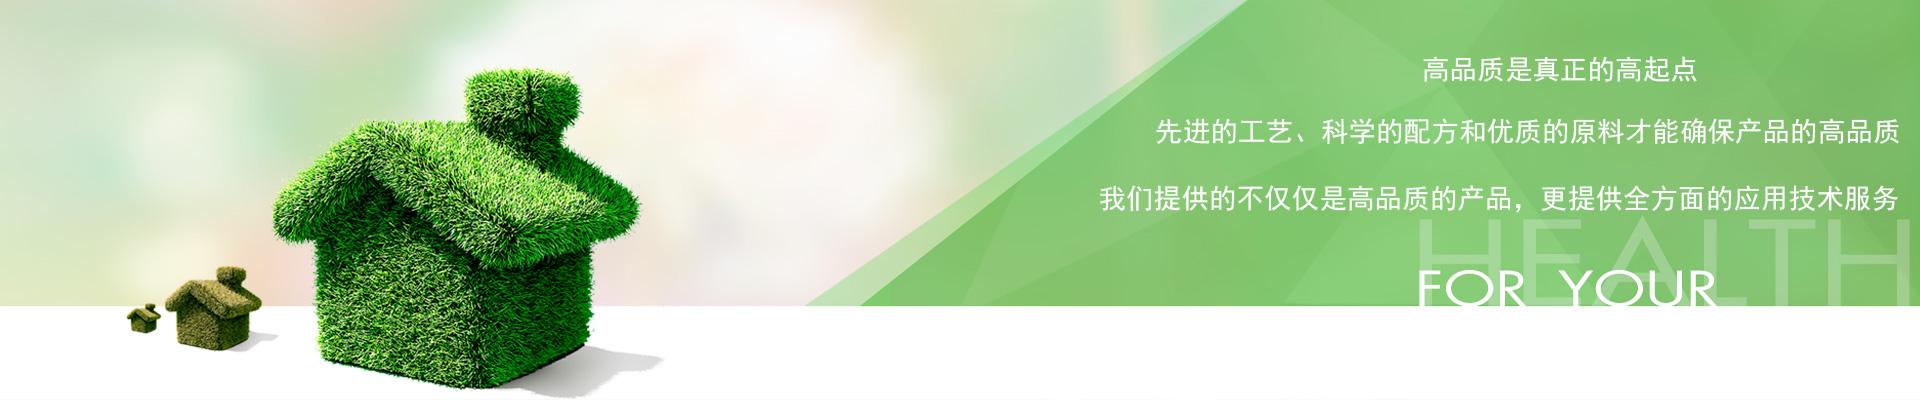 安徽本雅明涂料有限公司-banner1